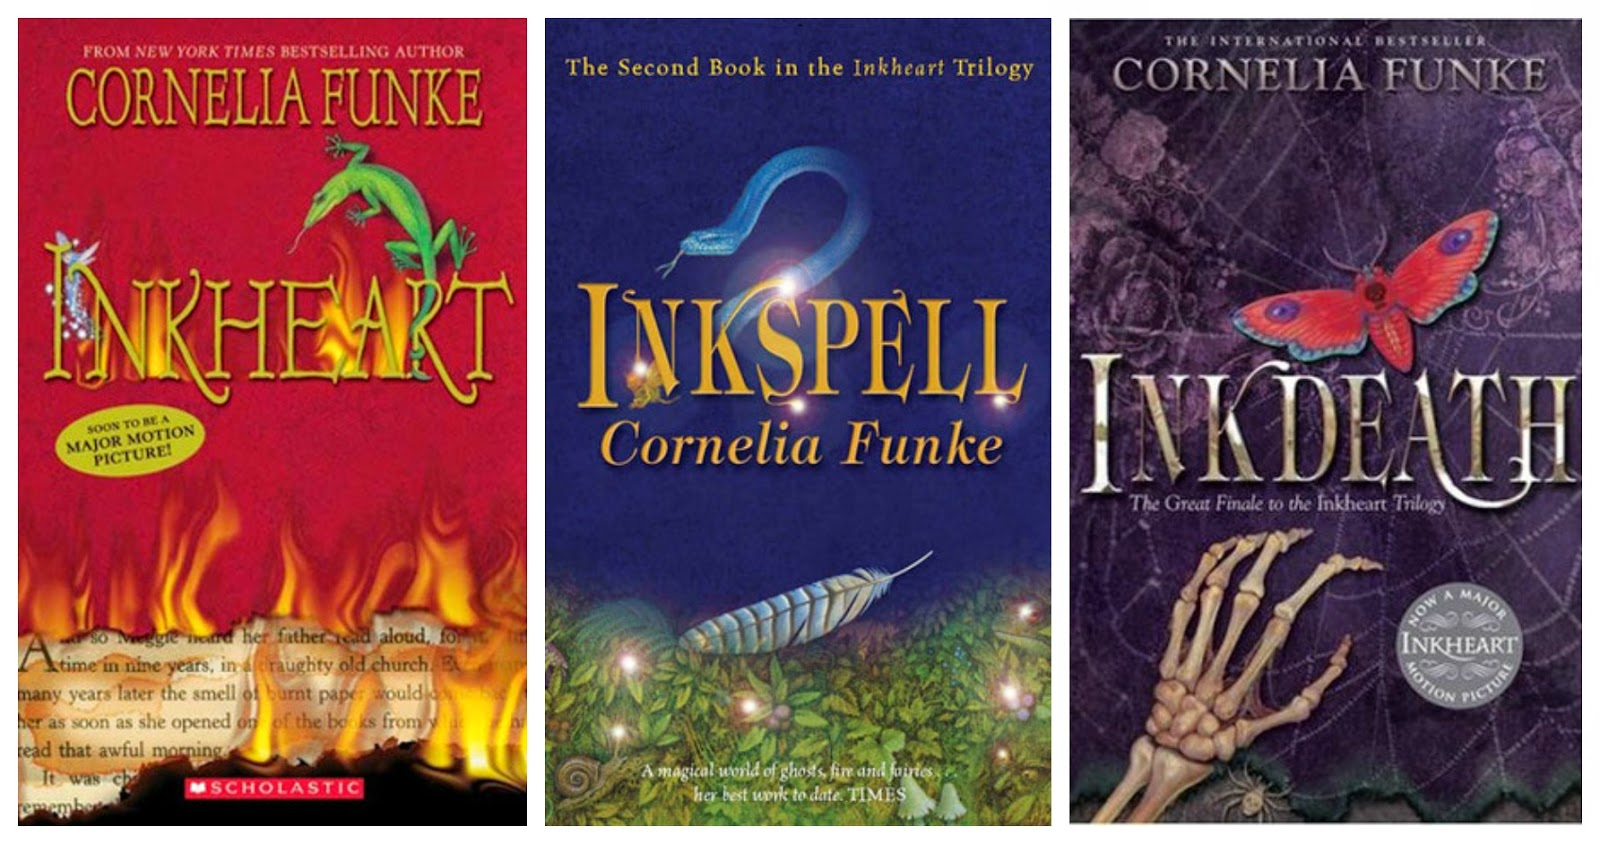 author essay cornelia funke Handpicked recommendations to authors who have a similar writing style to cornelia funke.